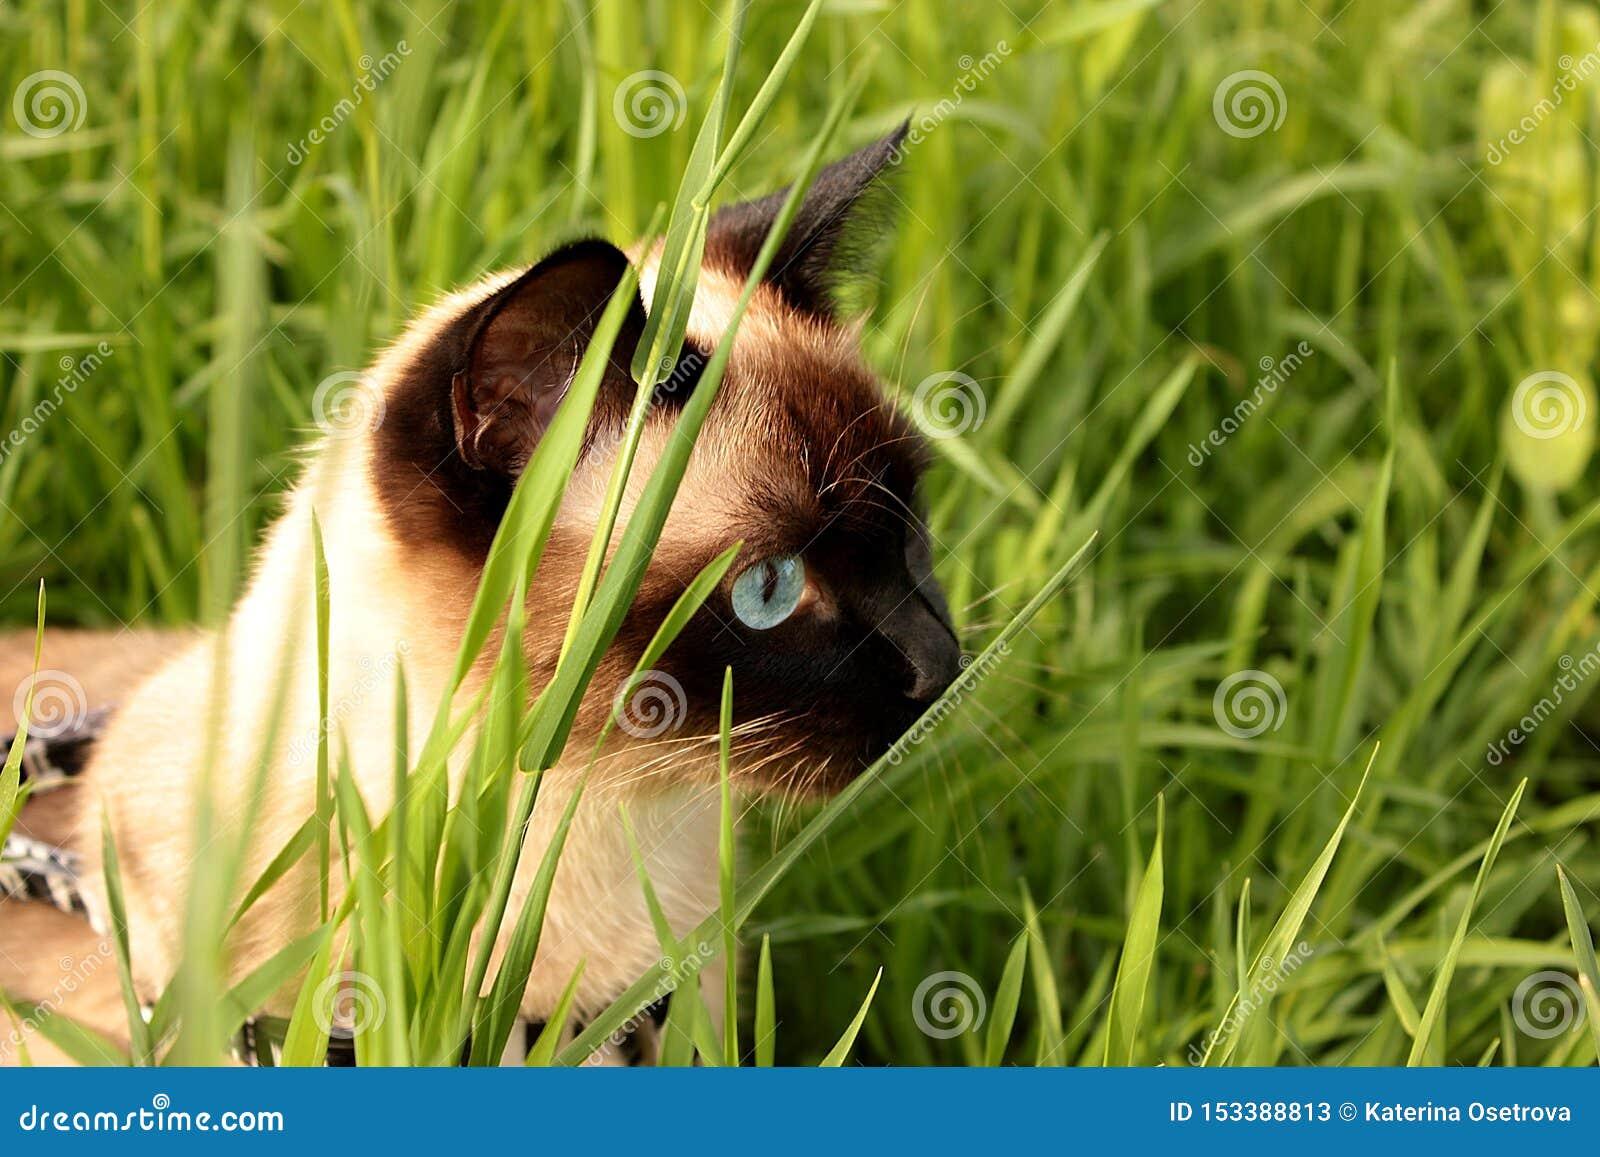 Den Siamese katten jagar i gräset